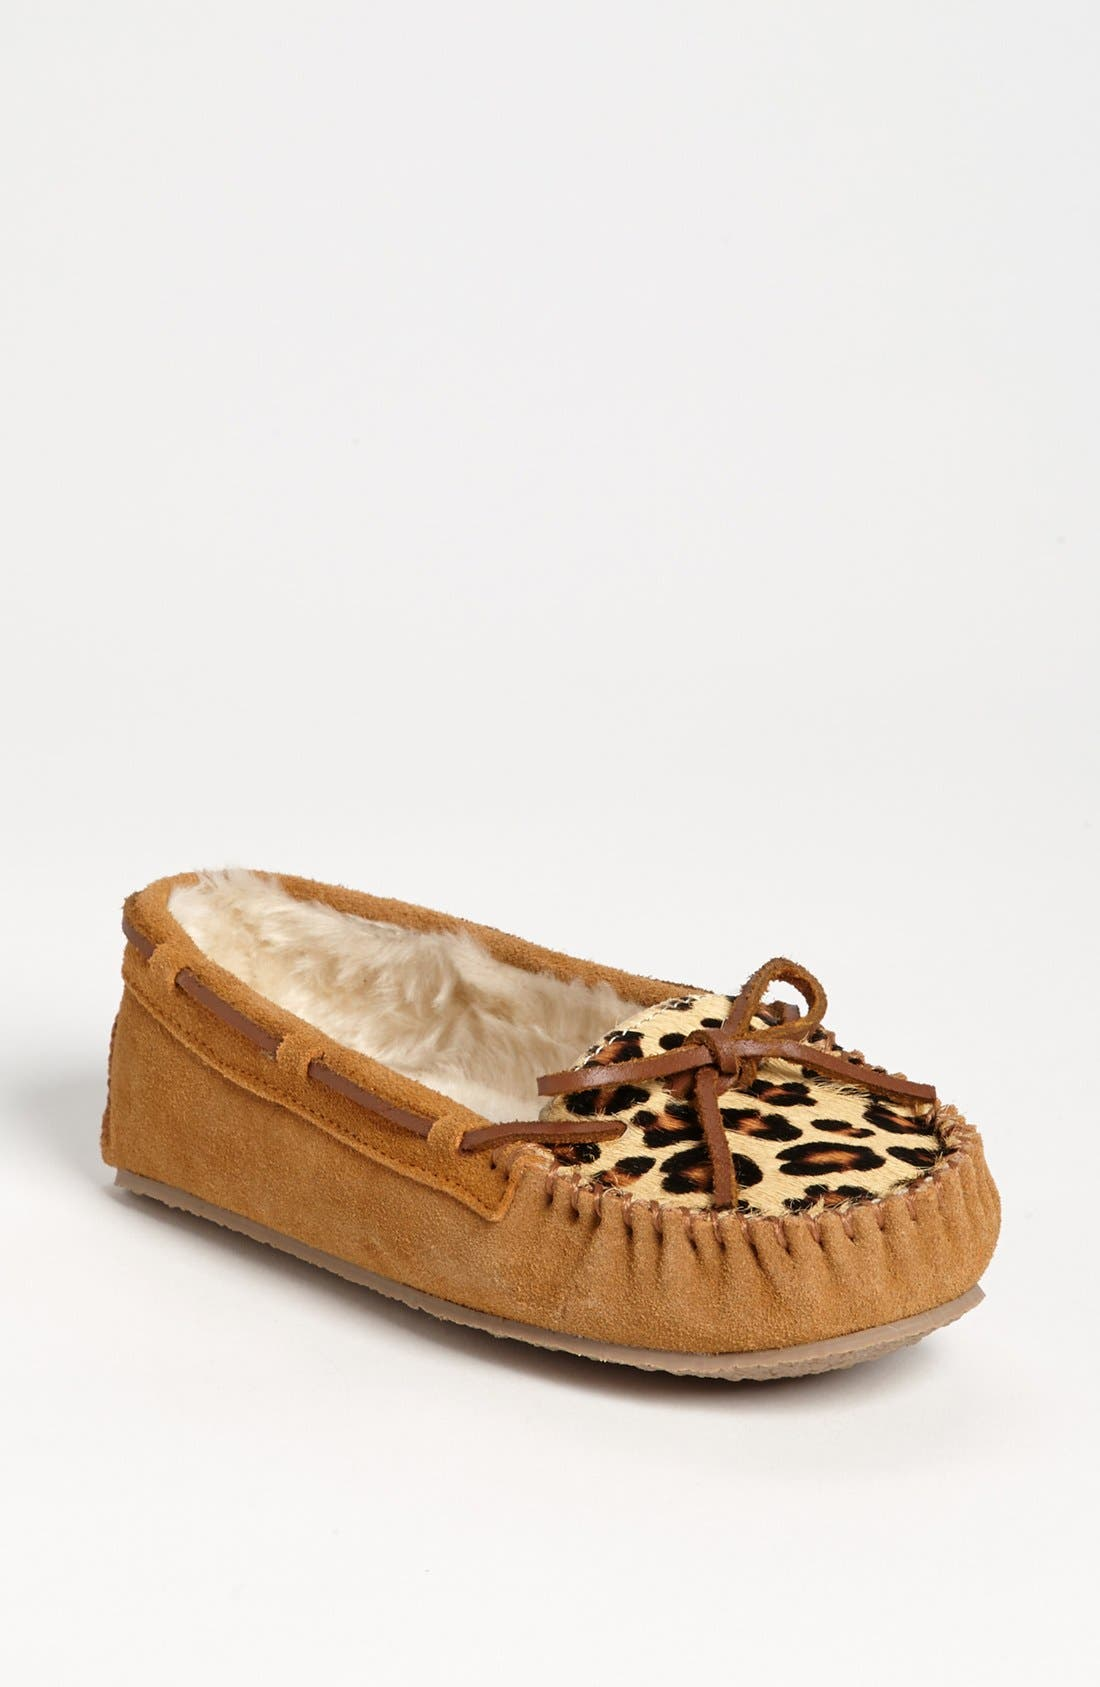 MINNETONKA 'Cally' Slipper, Main, color, CINNAMON